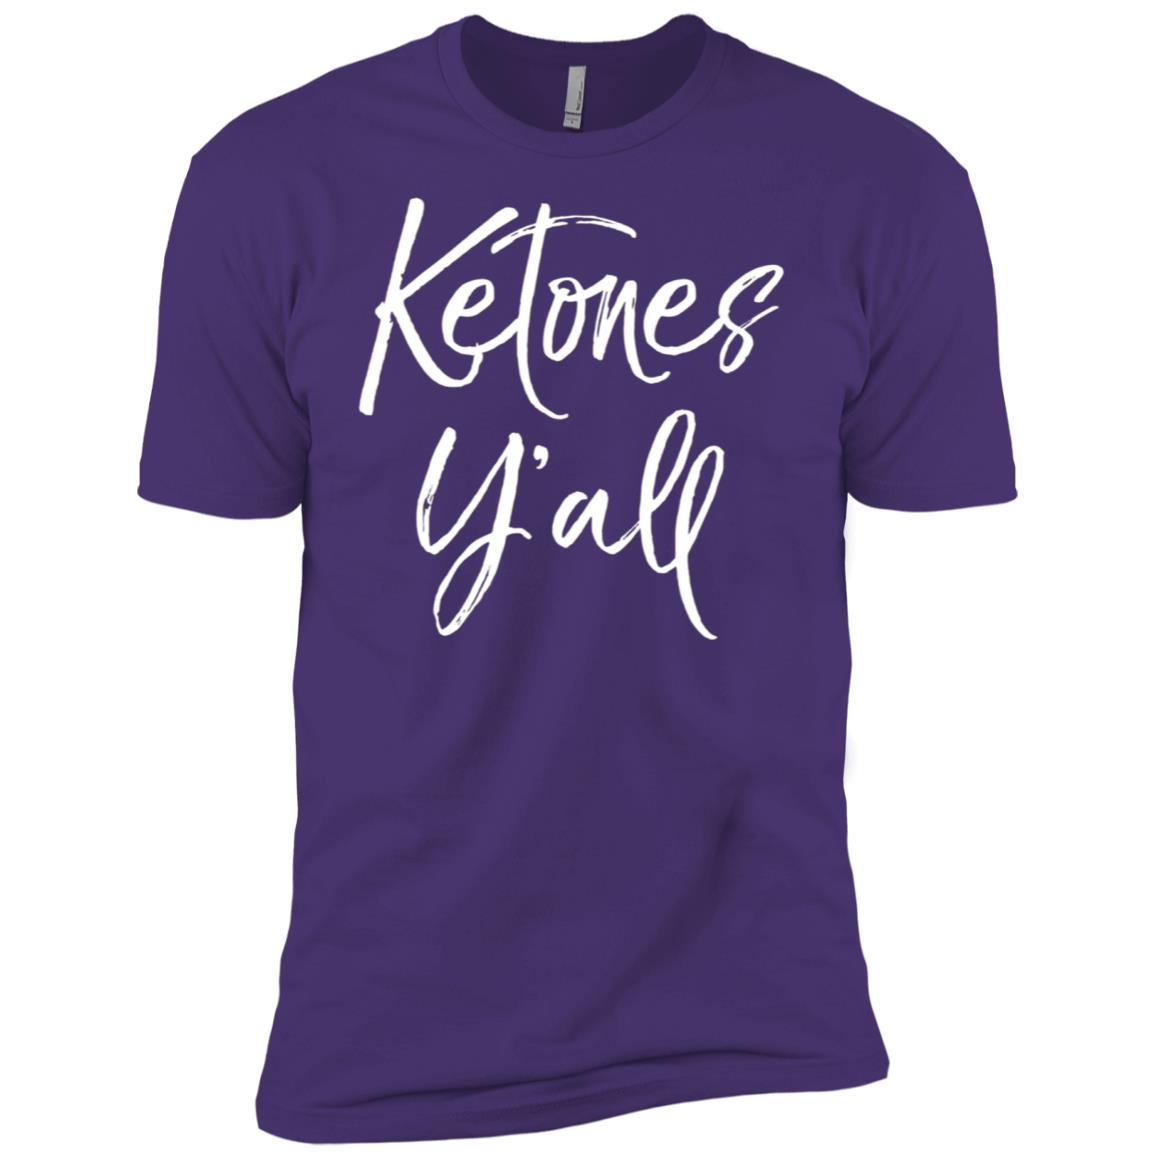 Ketones Y'all Fun Cute Southern Keto Diet Funny Tee Men Short Sleeve T-Shirt